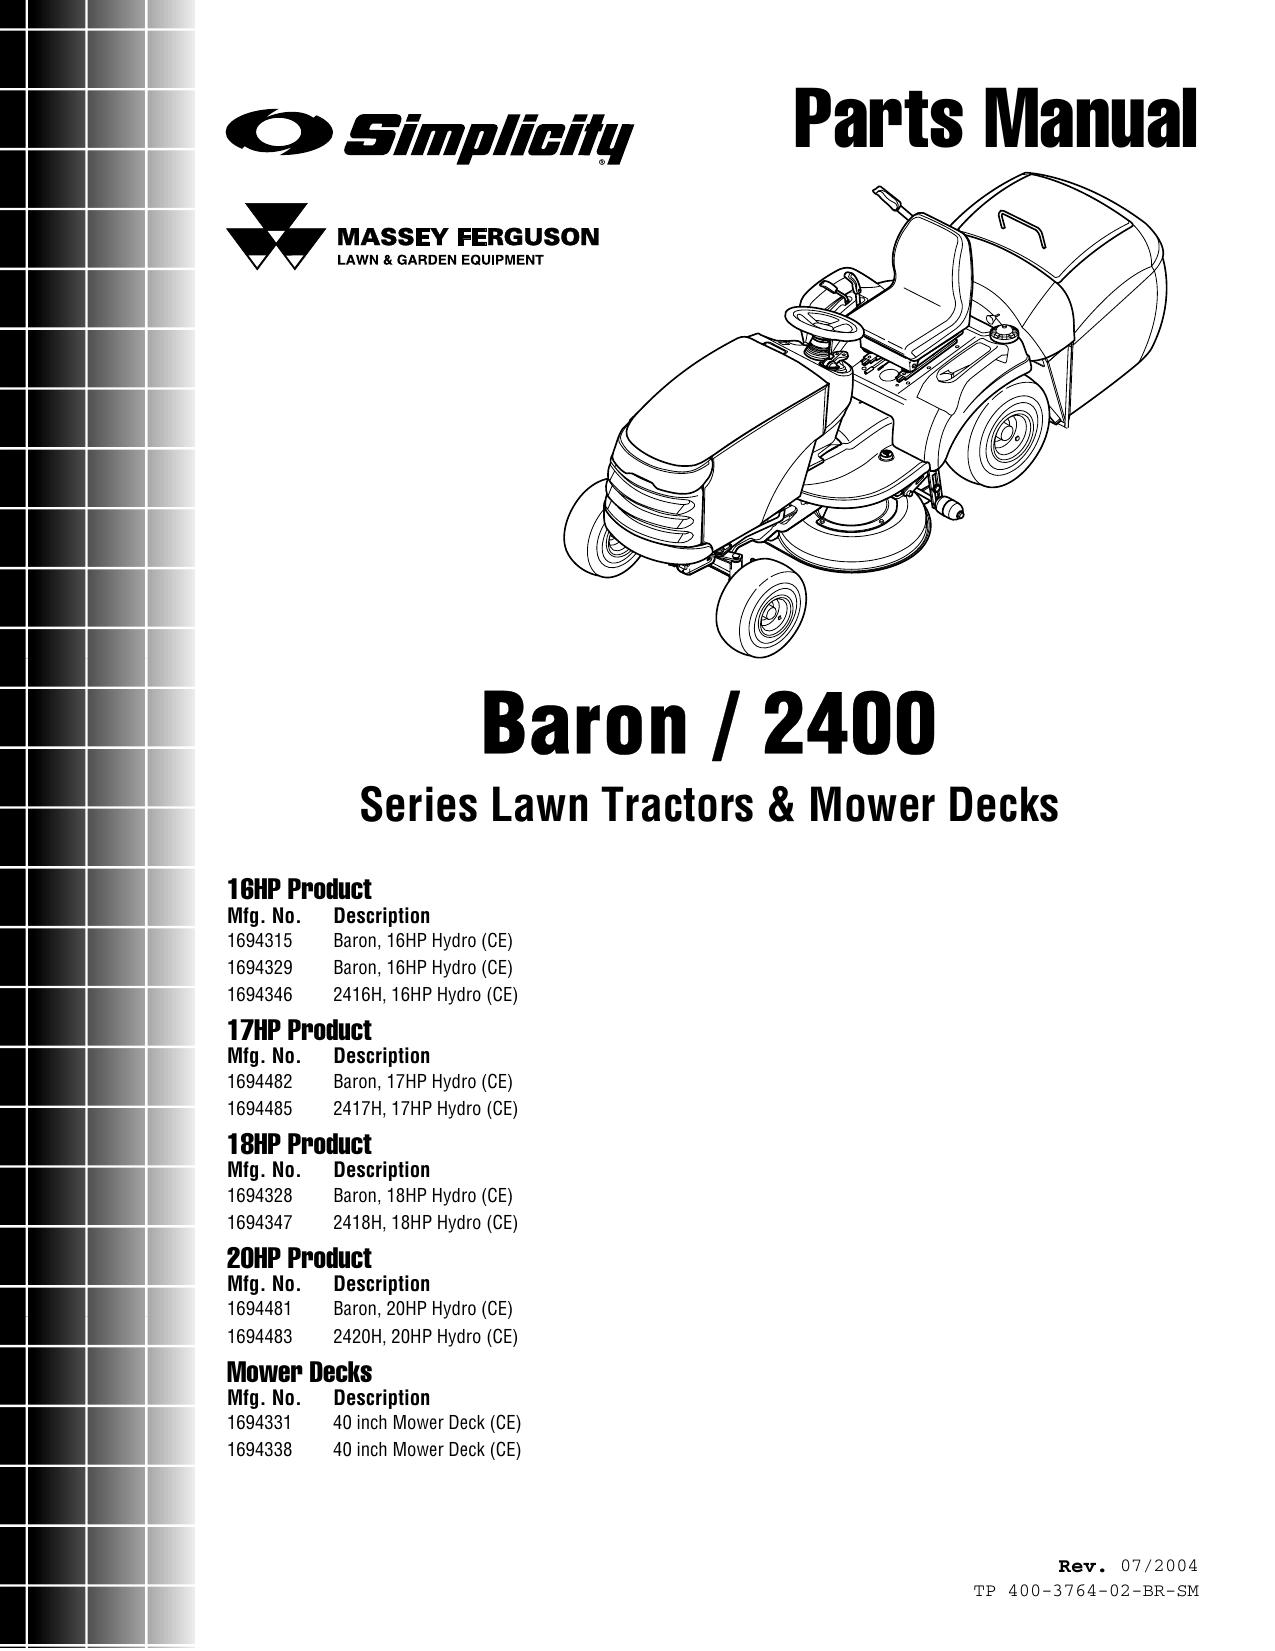 Simplicity Baron 2400 Parts Manual / Serieis